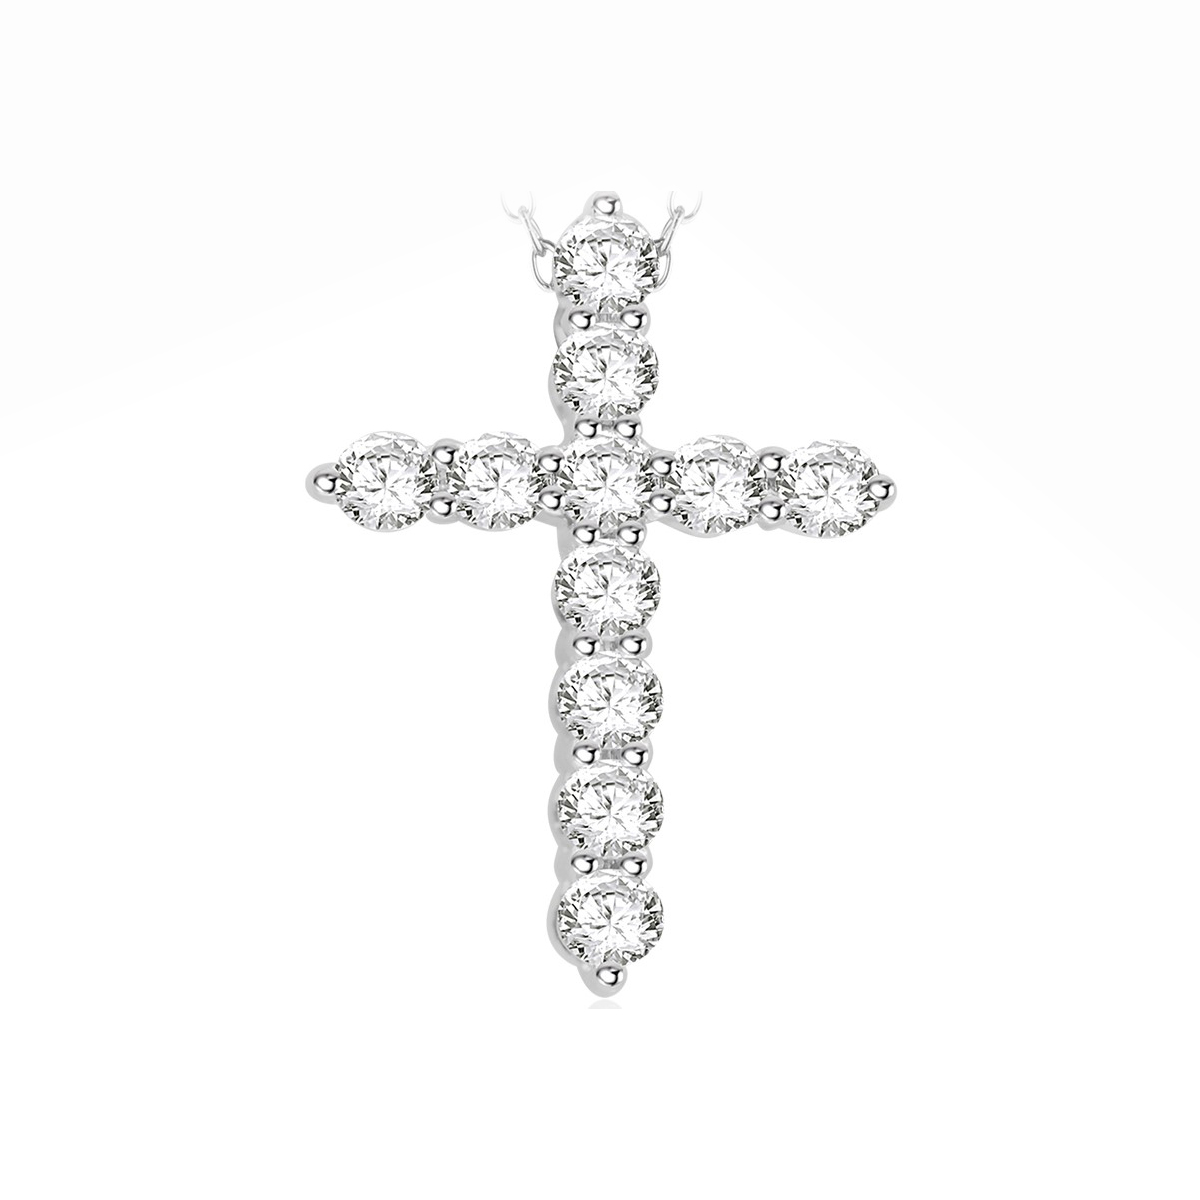 Paramount Gems 14 Karat White Gold .5 Carat Diamond Cross Necklace